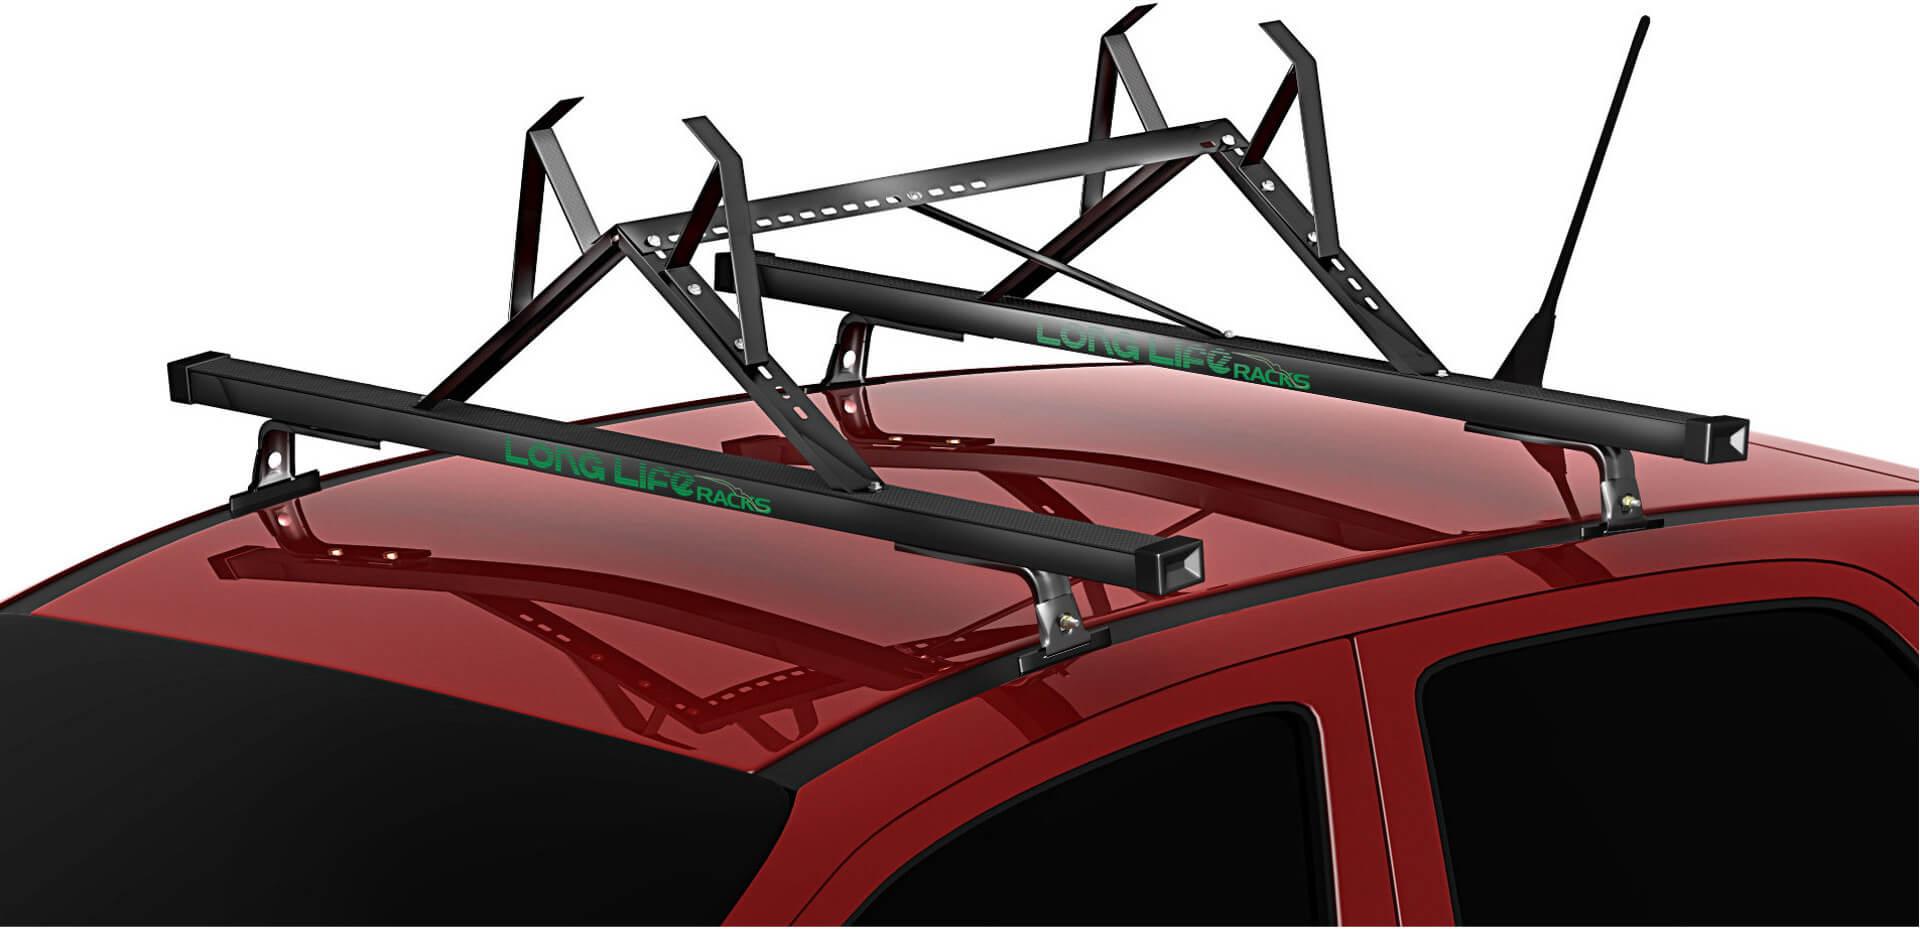 Kit Rack + Porta Escadas Teto Bagageiro Kadett Corsa Astra Celta Ipanema Aco Longlife (Ref. PE + K1)  - Unicar